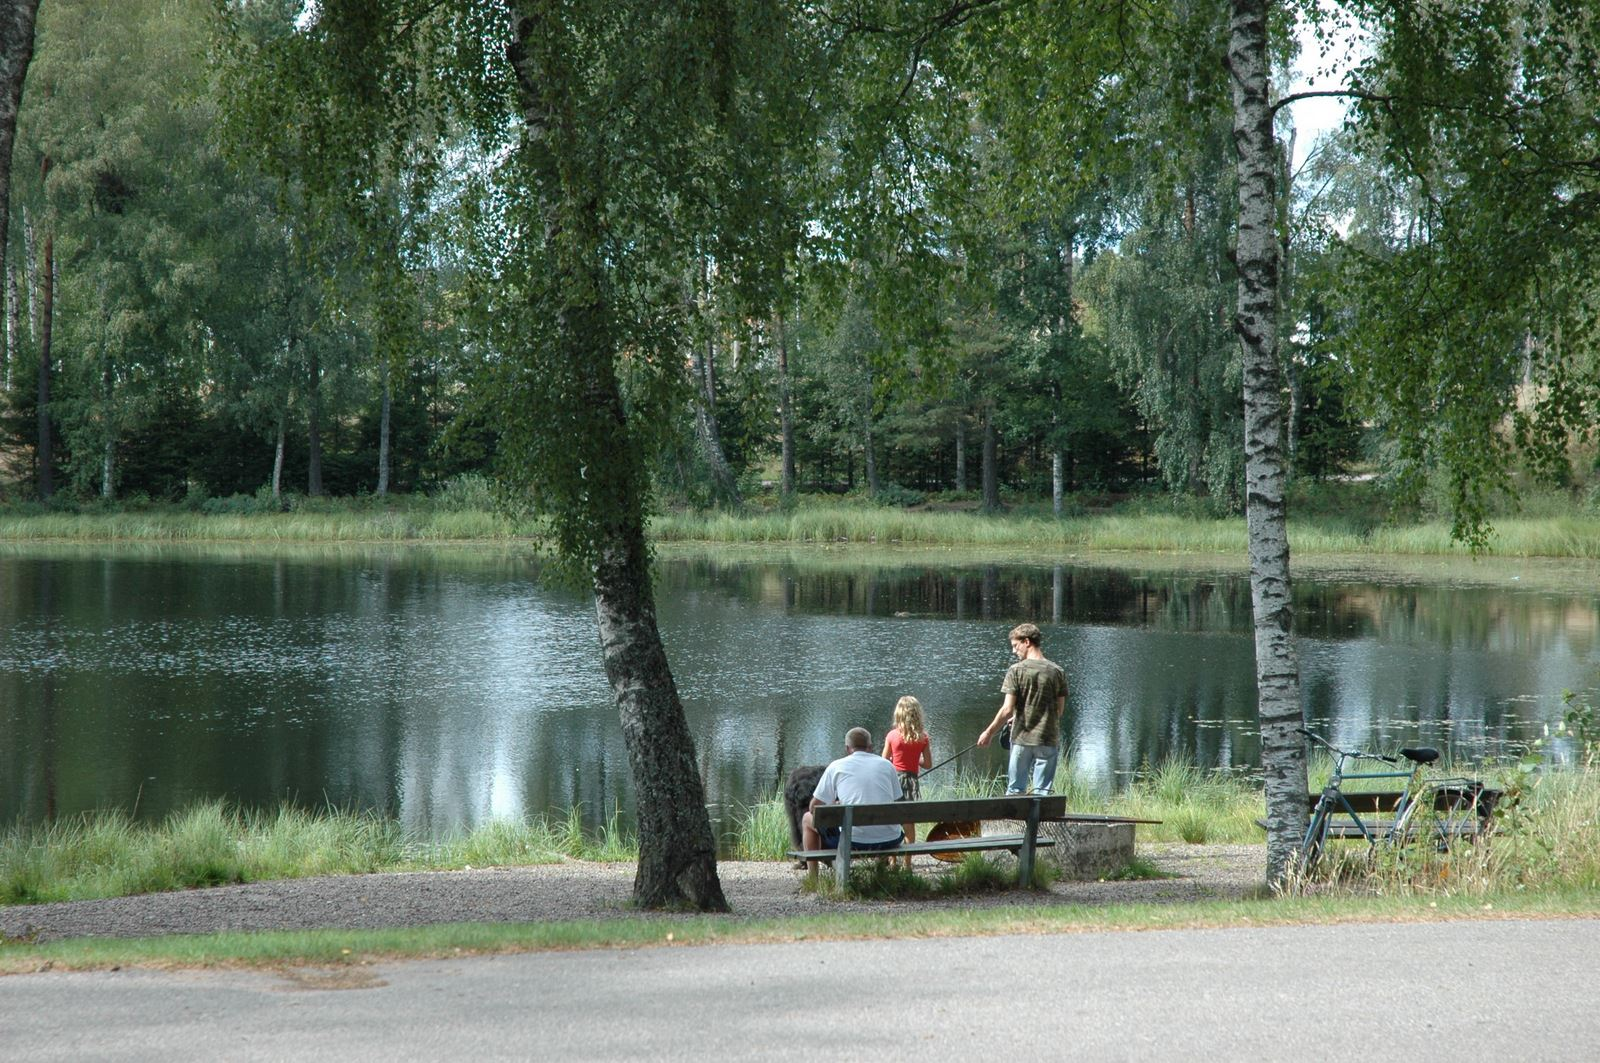 Gislaveds kommun,  © Gislaveds kommun, Hörsjöns Camping und Freizeit